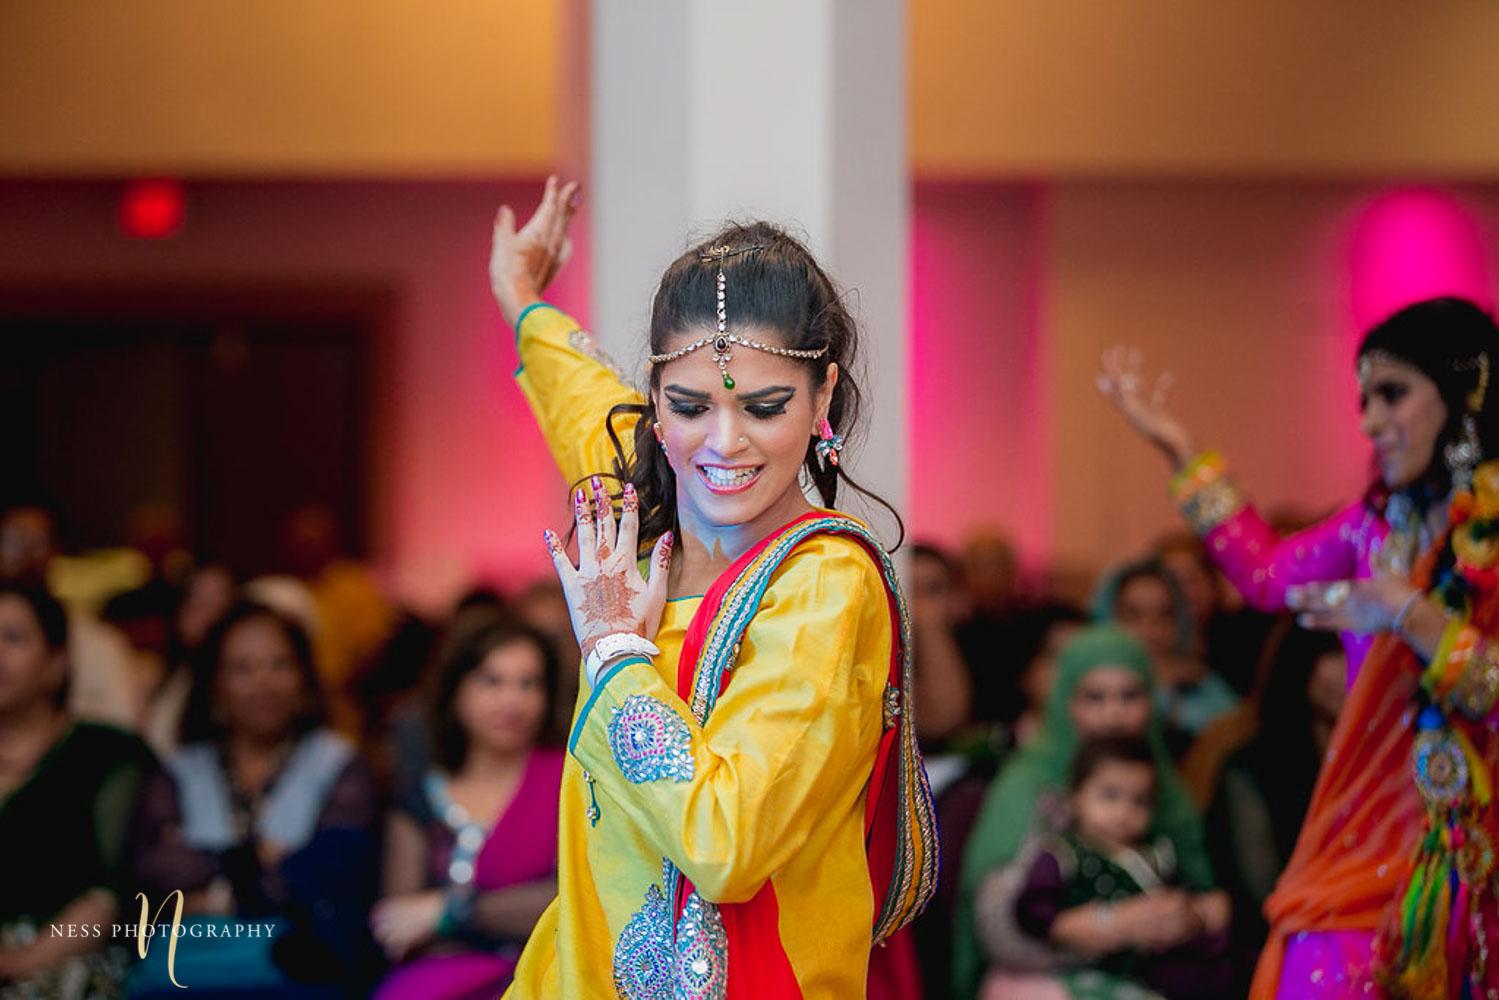 bridesmaid performing bollywood dance at mehendi wearing yellow shalwar kameez